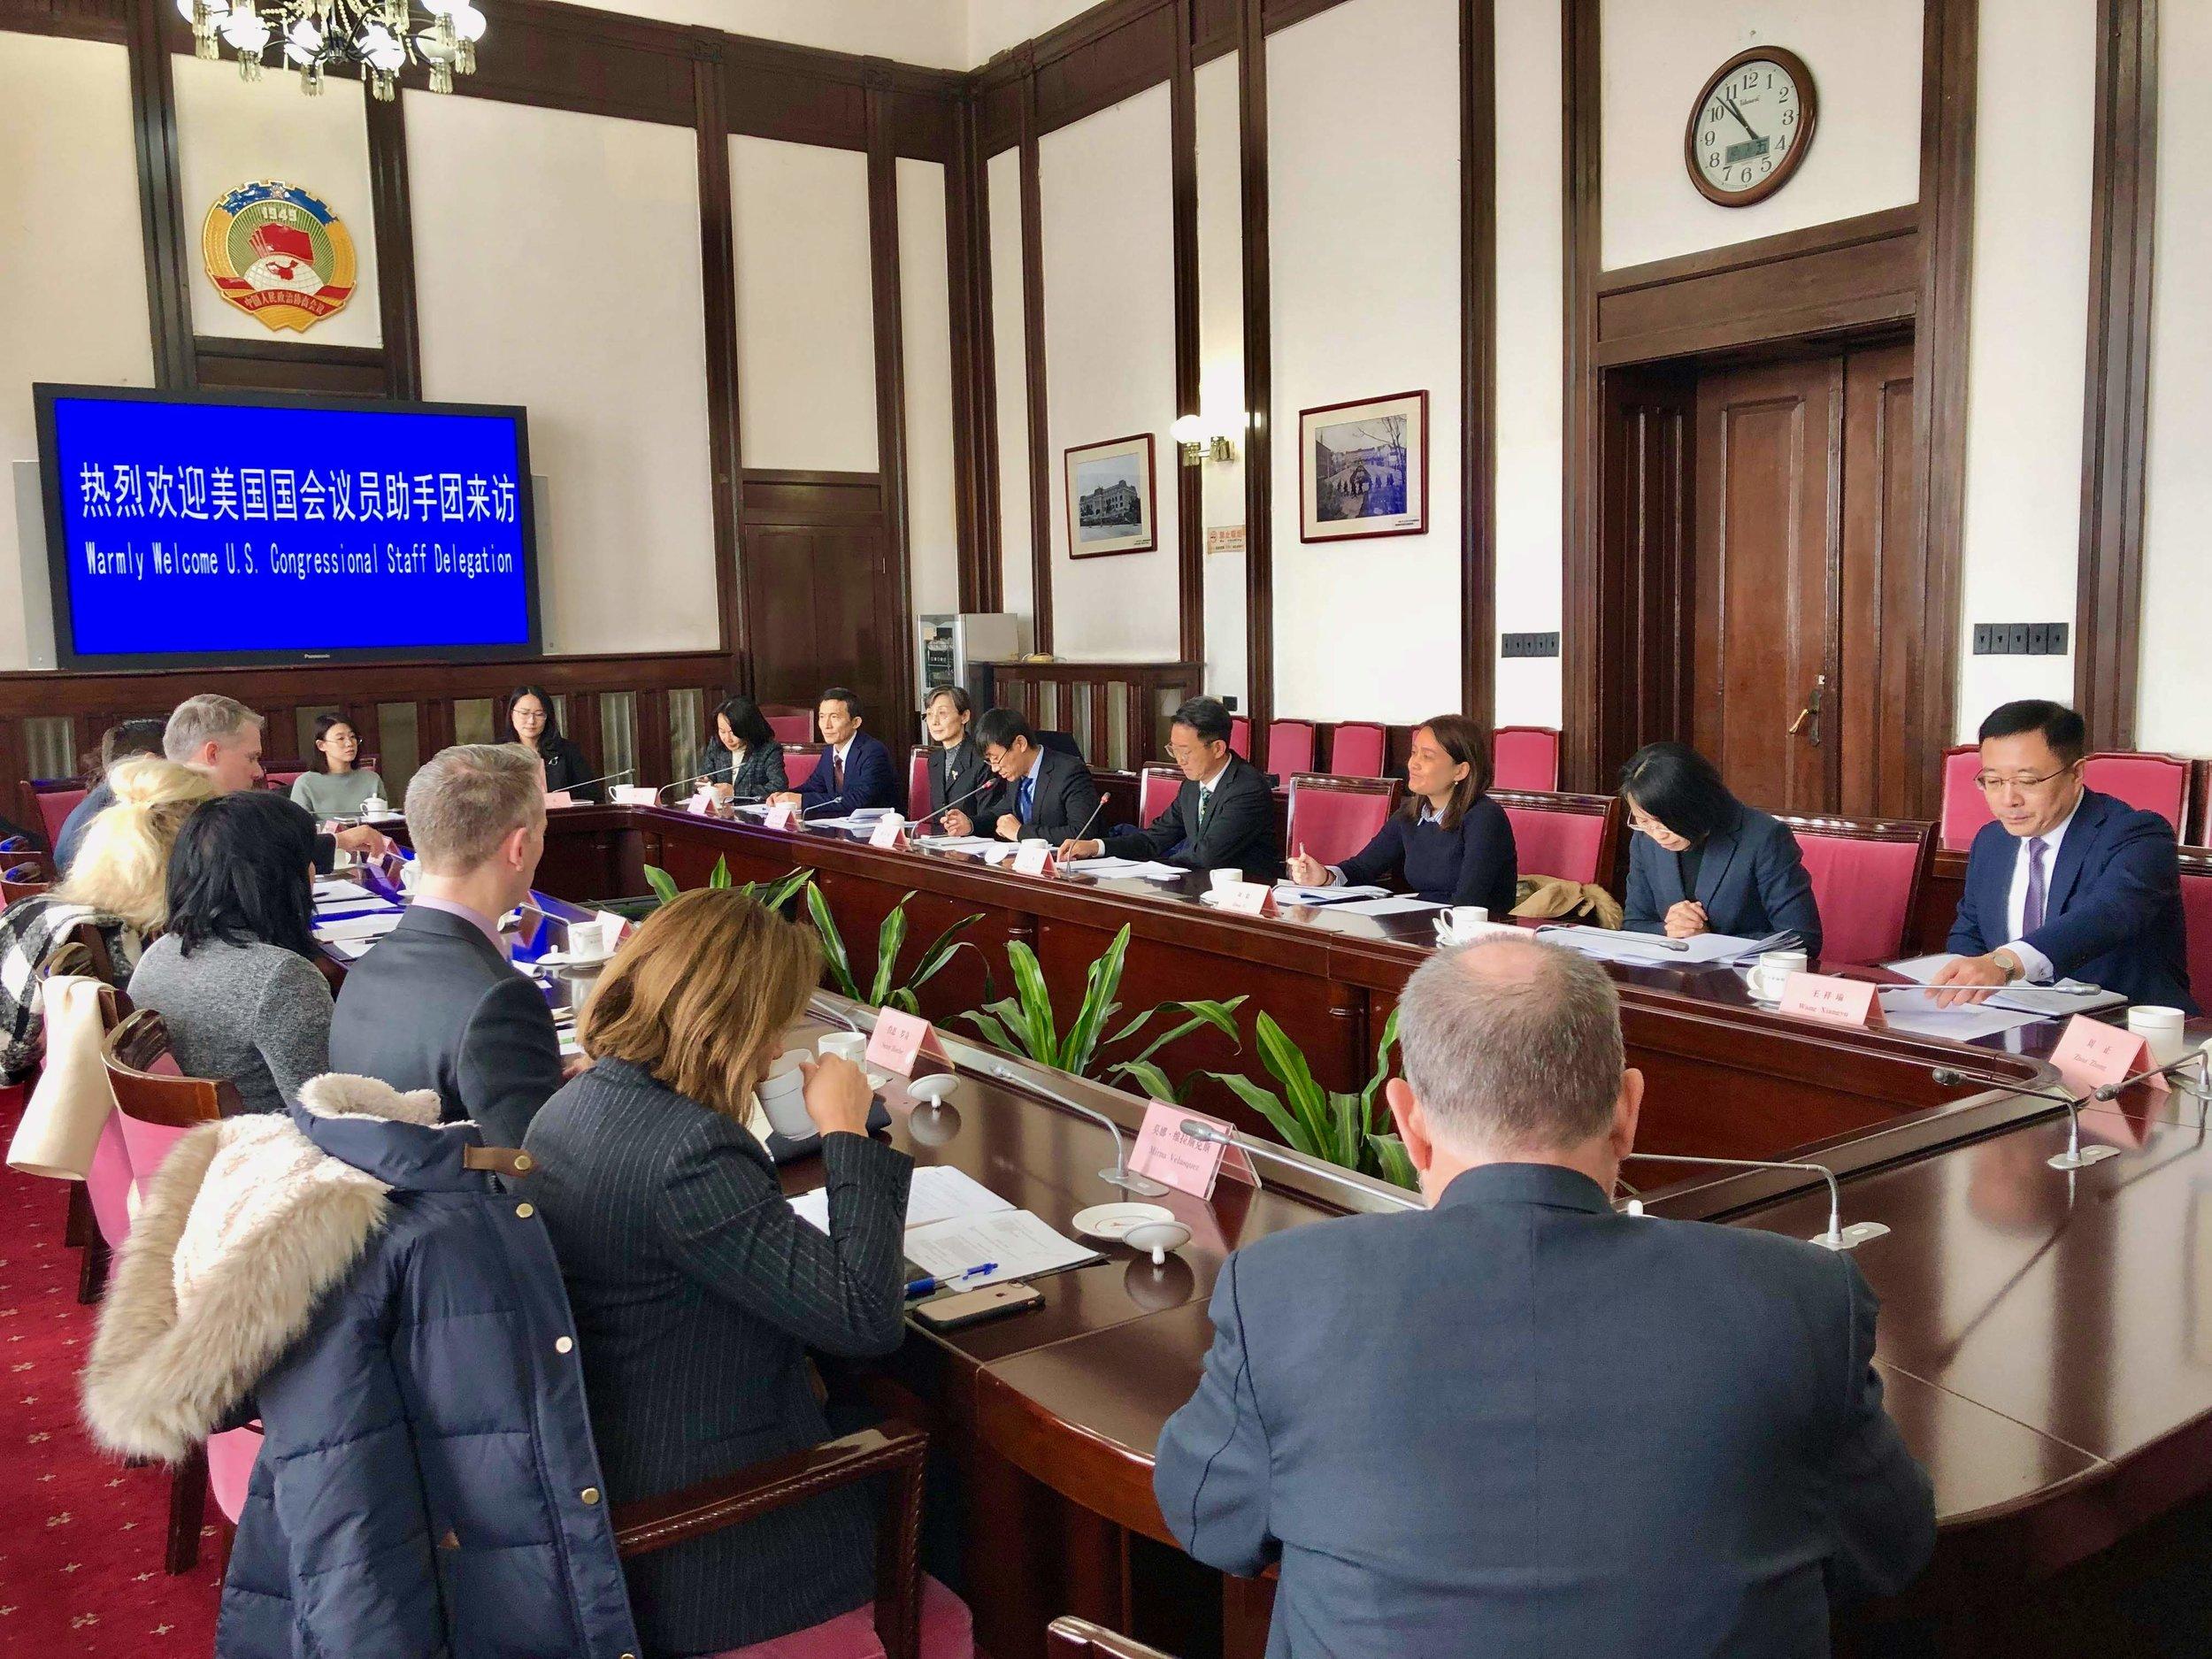 Qingdao Meeting 3.jpg